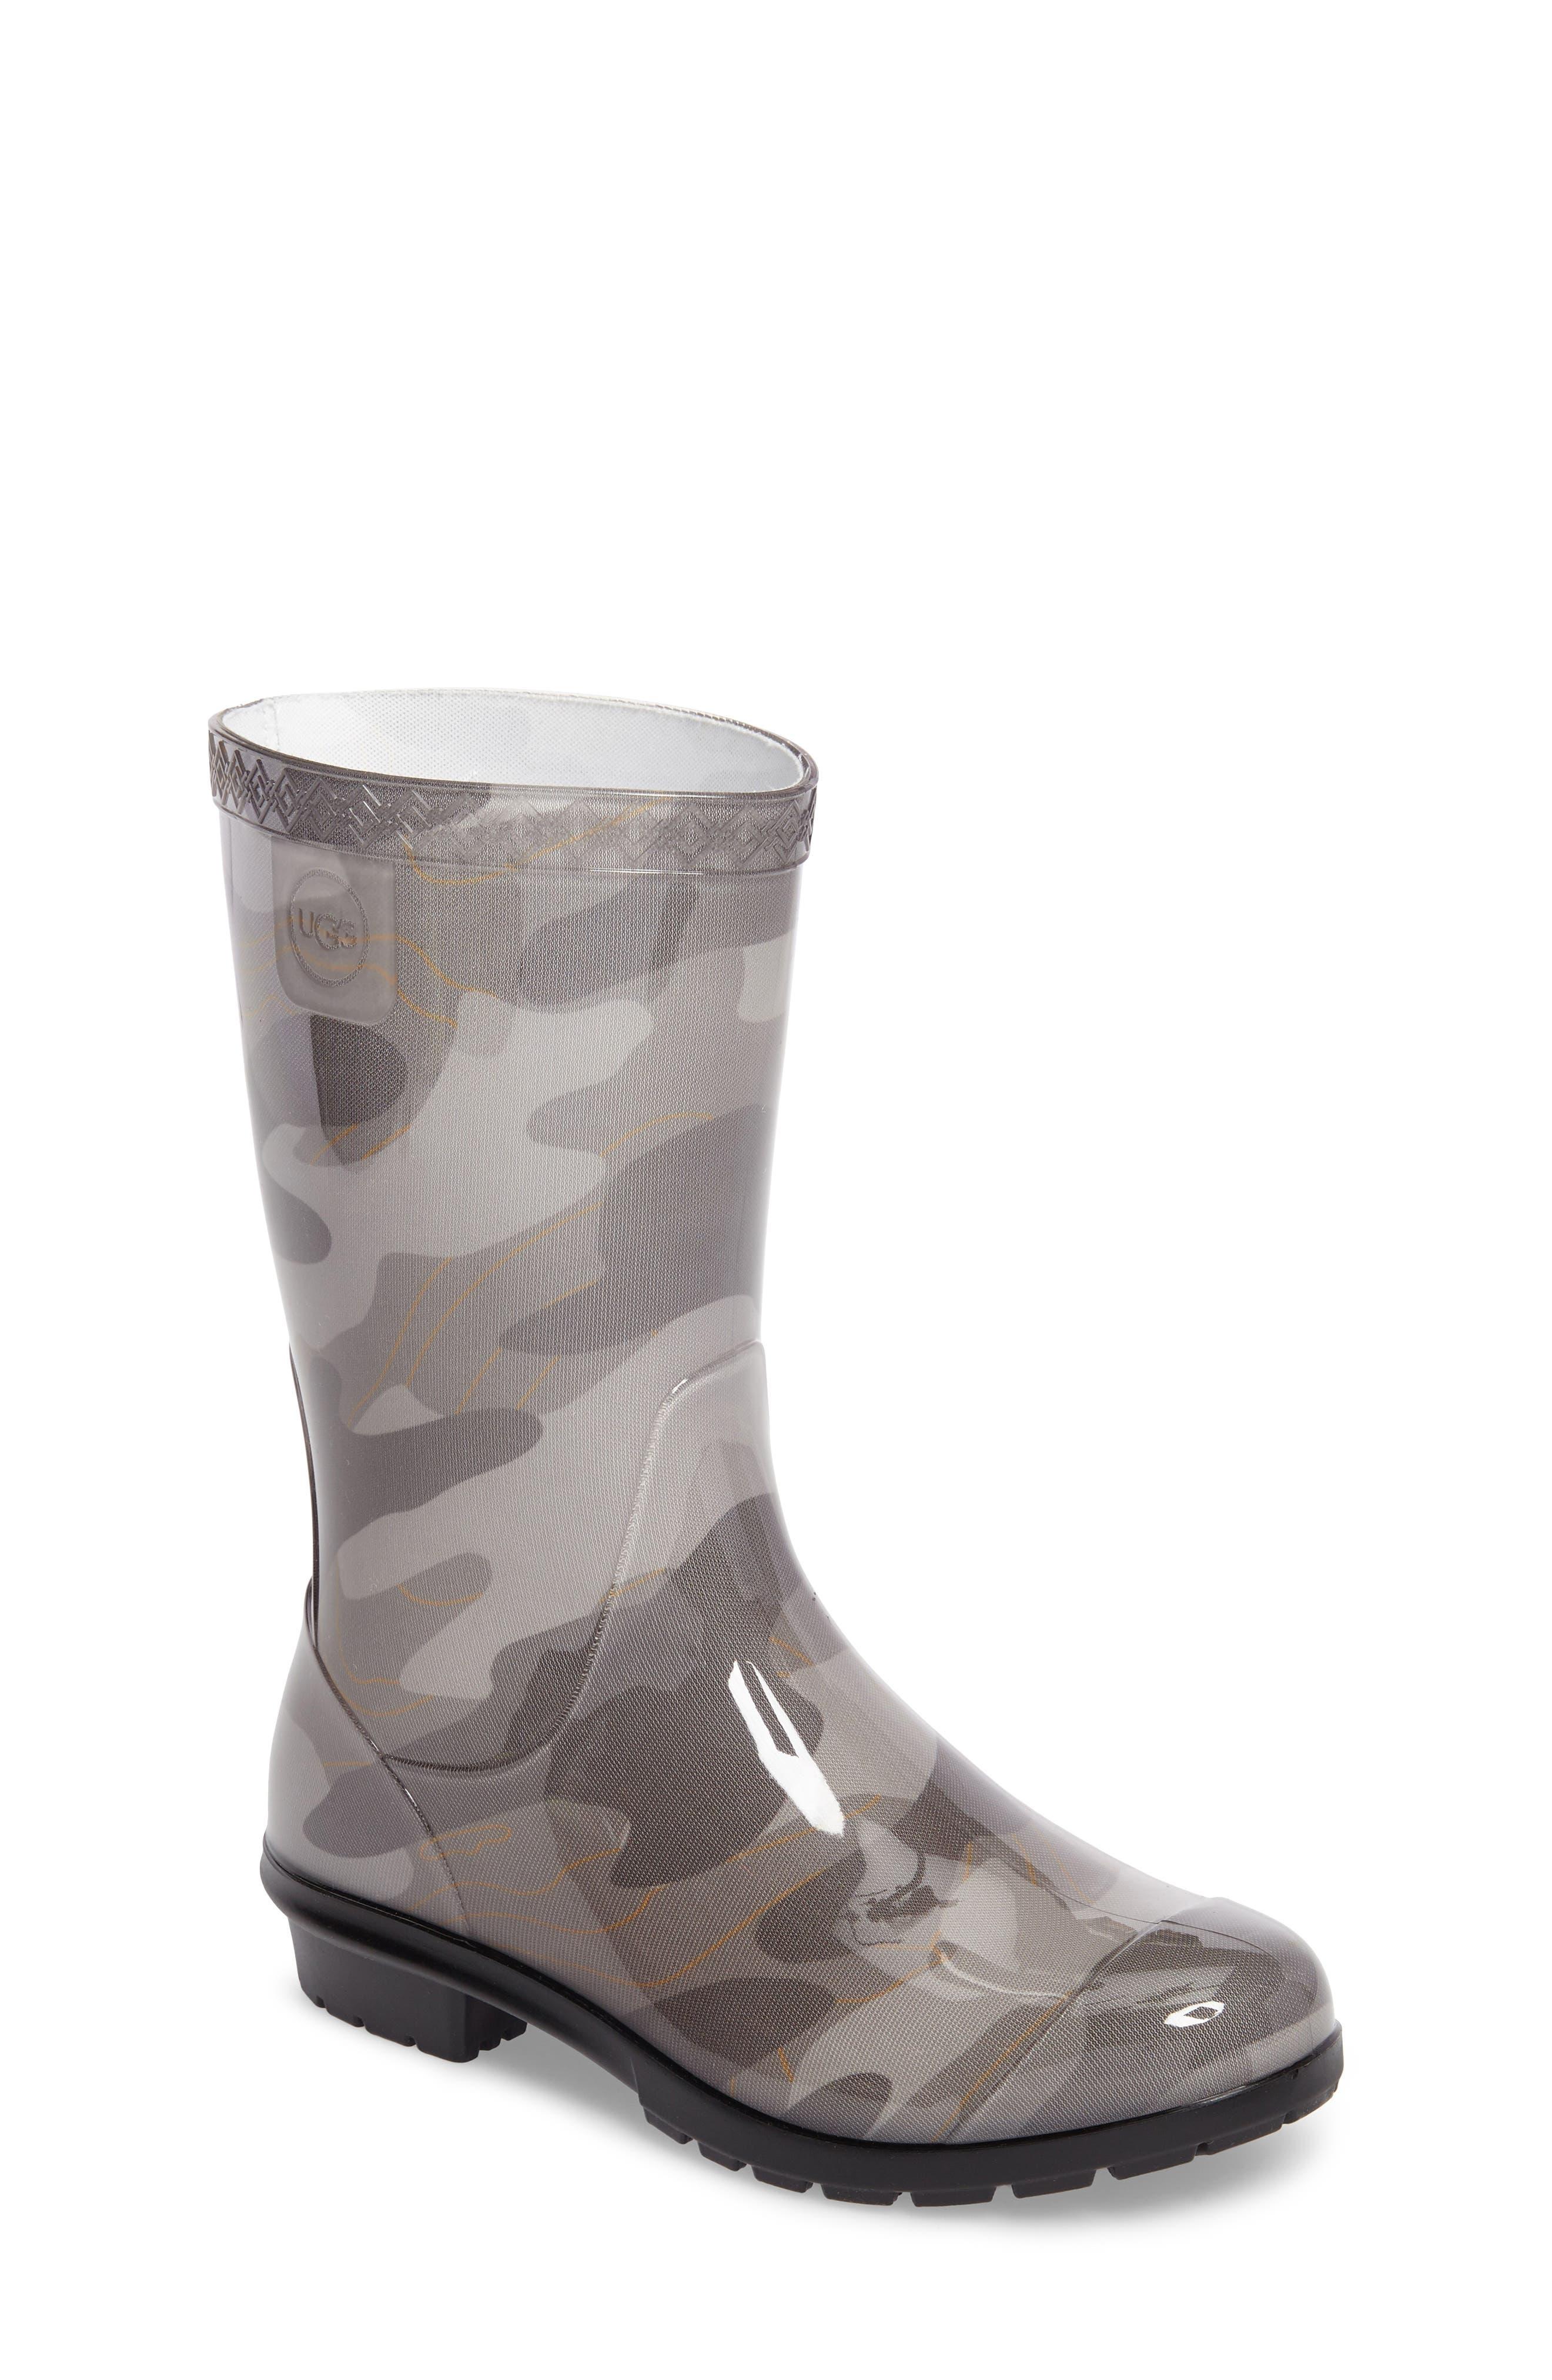 Rahjee Camo Waterproof Rain Boot,                             Main thumbnail 1, color,                             020